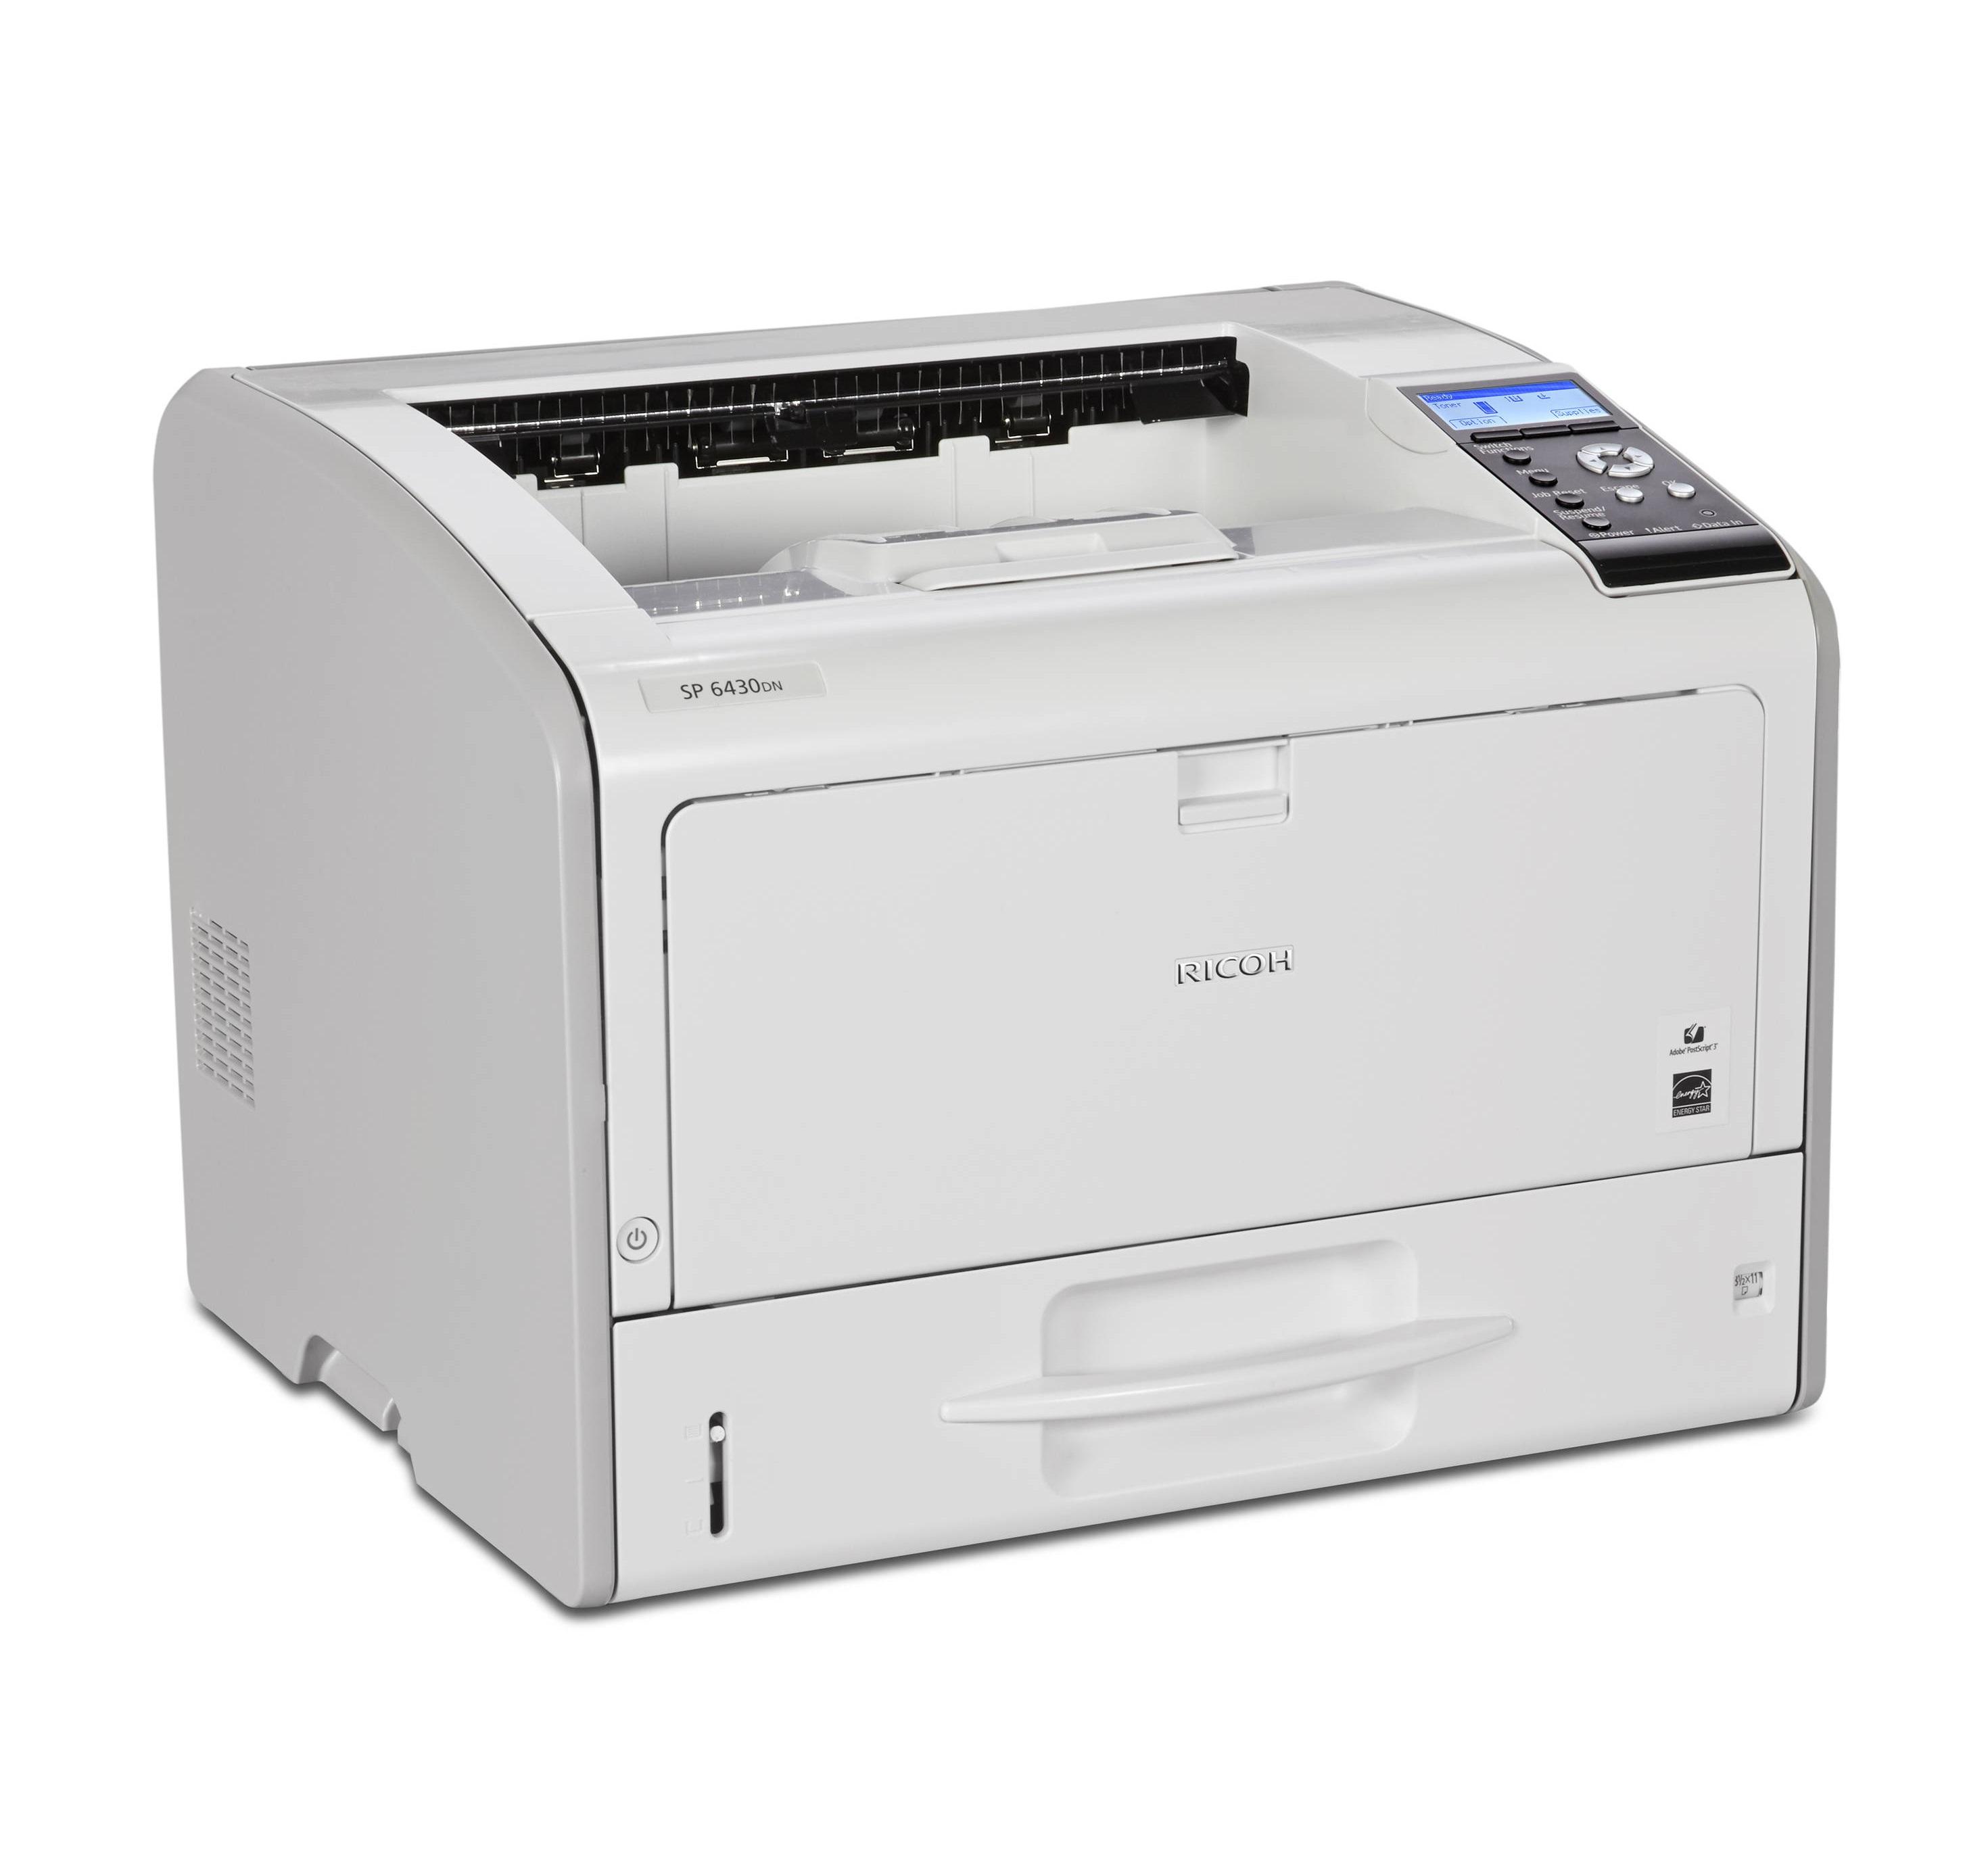 https://tryamm.ro/en/products/office-printers-fax-scanners-en/a4-printers/monochrome-printers/